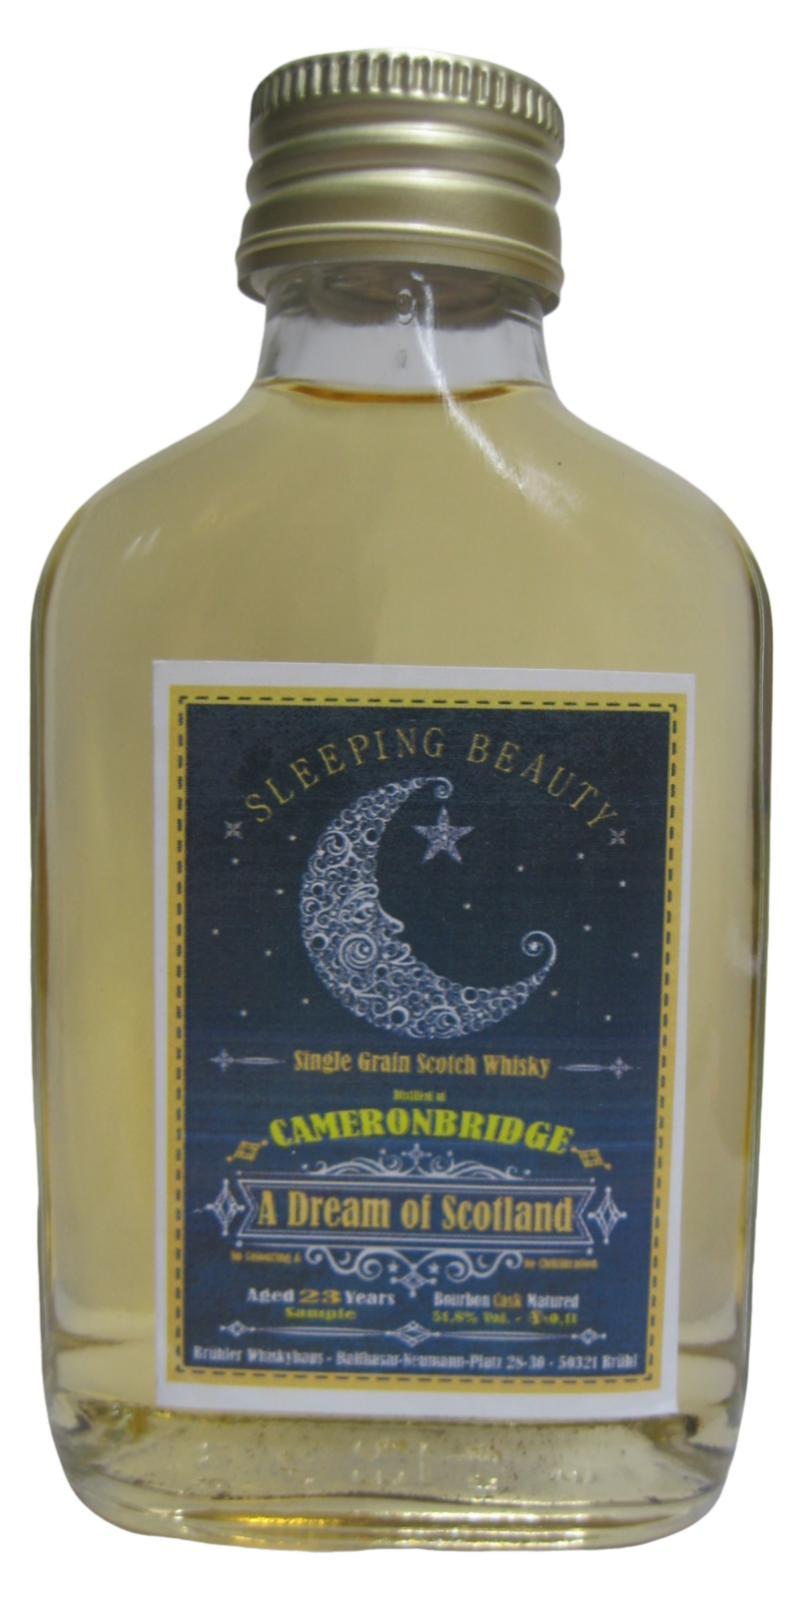 Cameronbridge 23-year-old BW